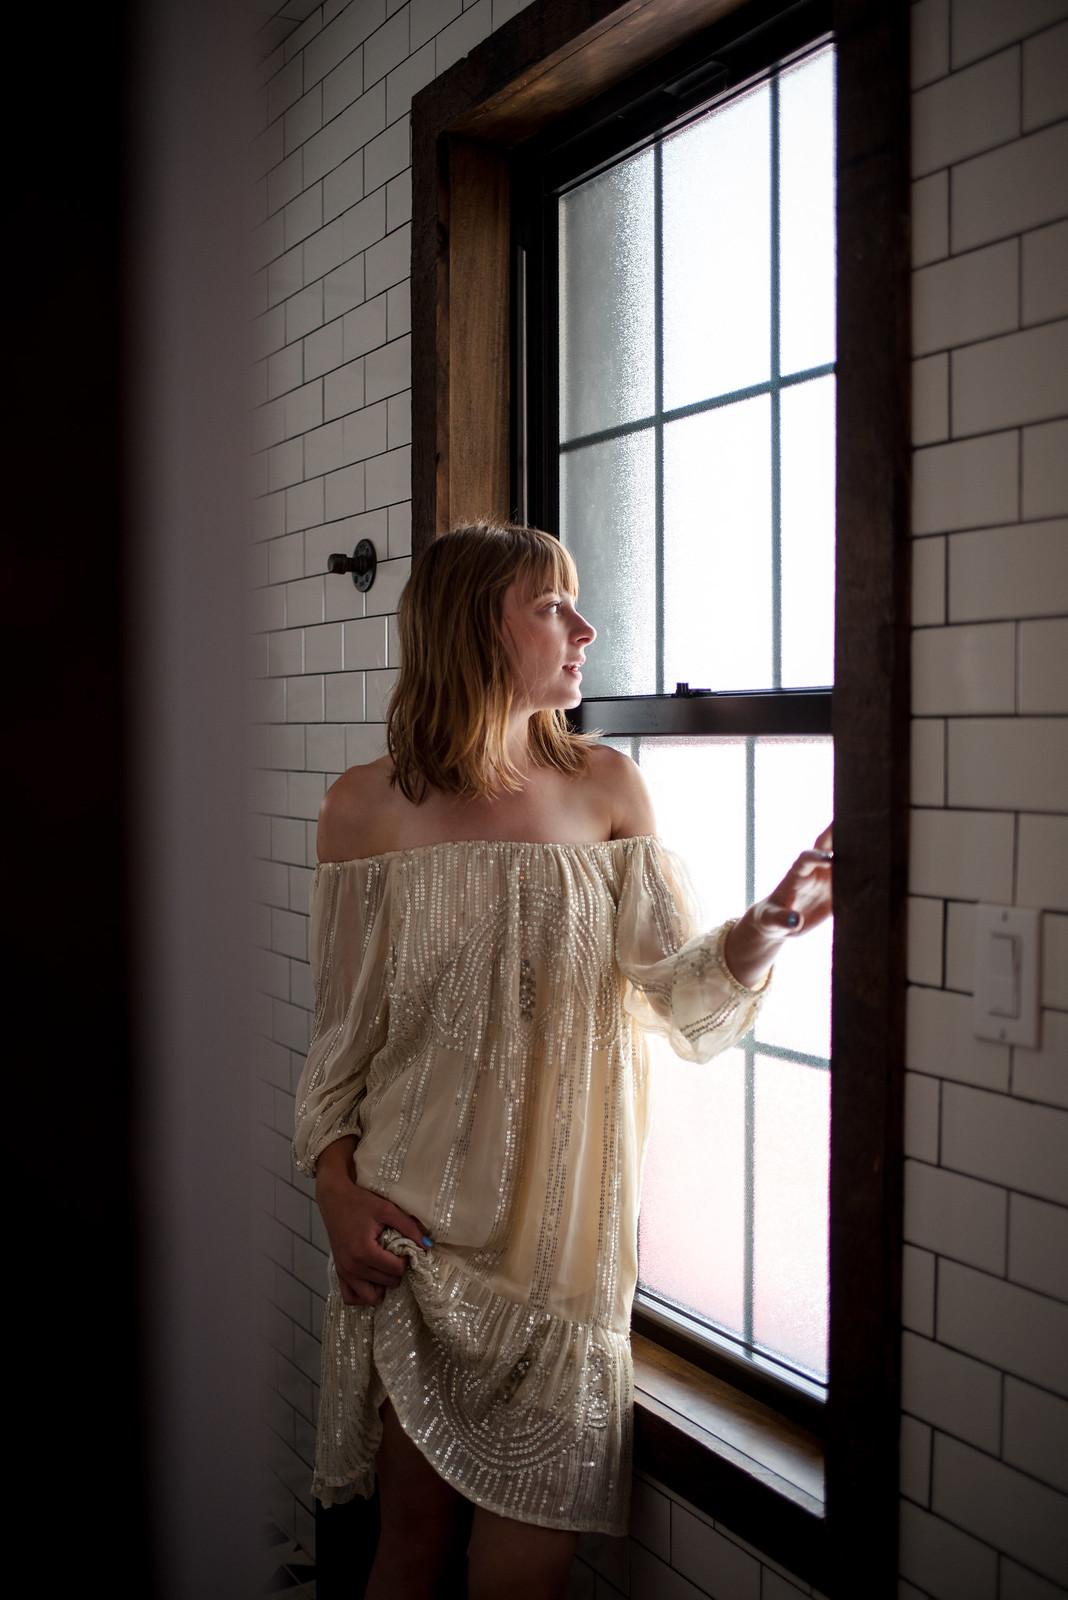 Sequin Dress in the window on juliettelaura.blogspot.com